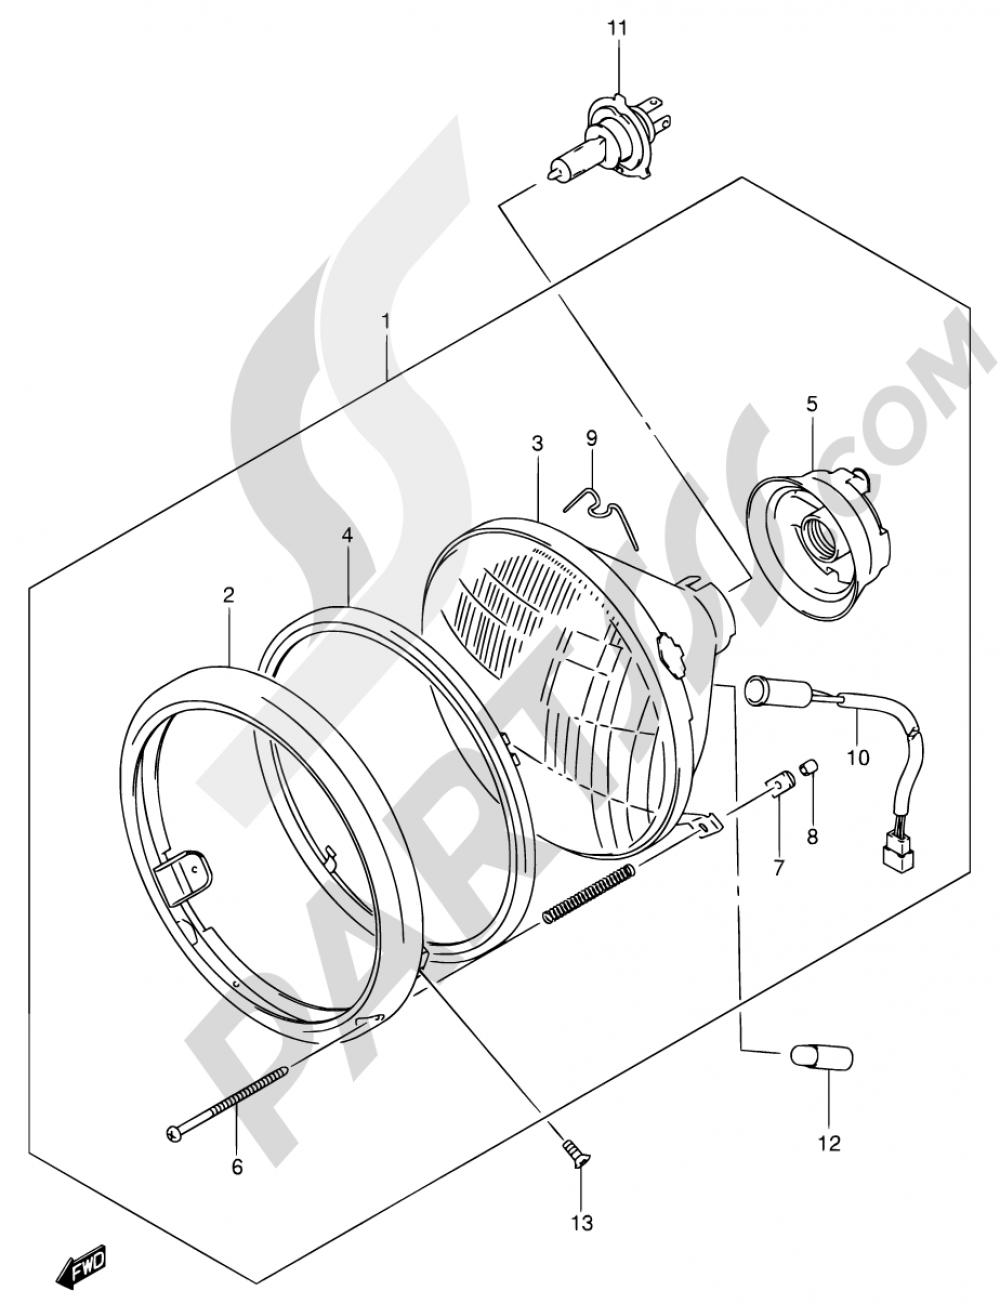 29 - HEADLAMP ASSY (MODEL K1/K2/K3/K4 E02,E19) Suzuki INTRUDER VL800 2002